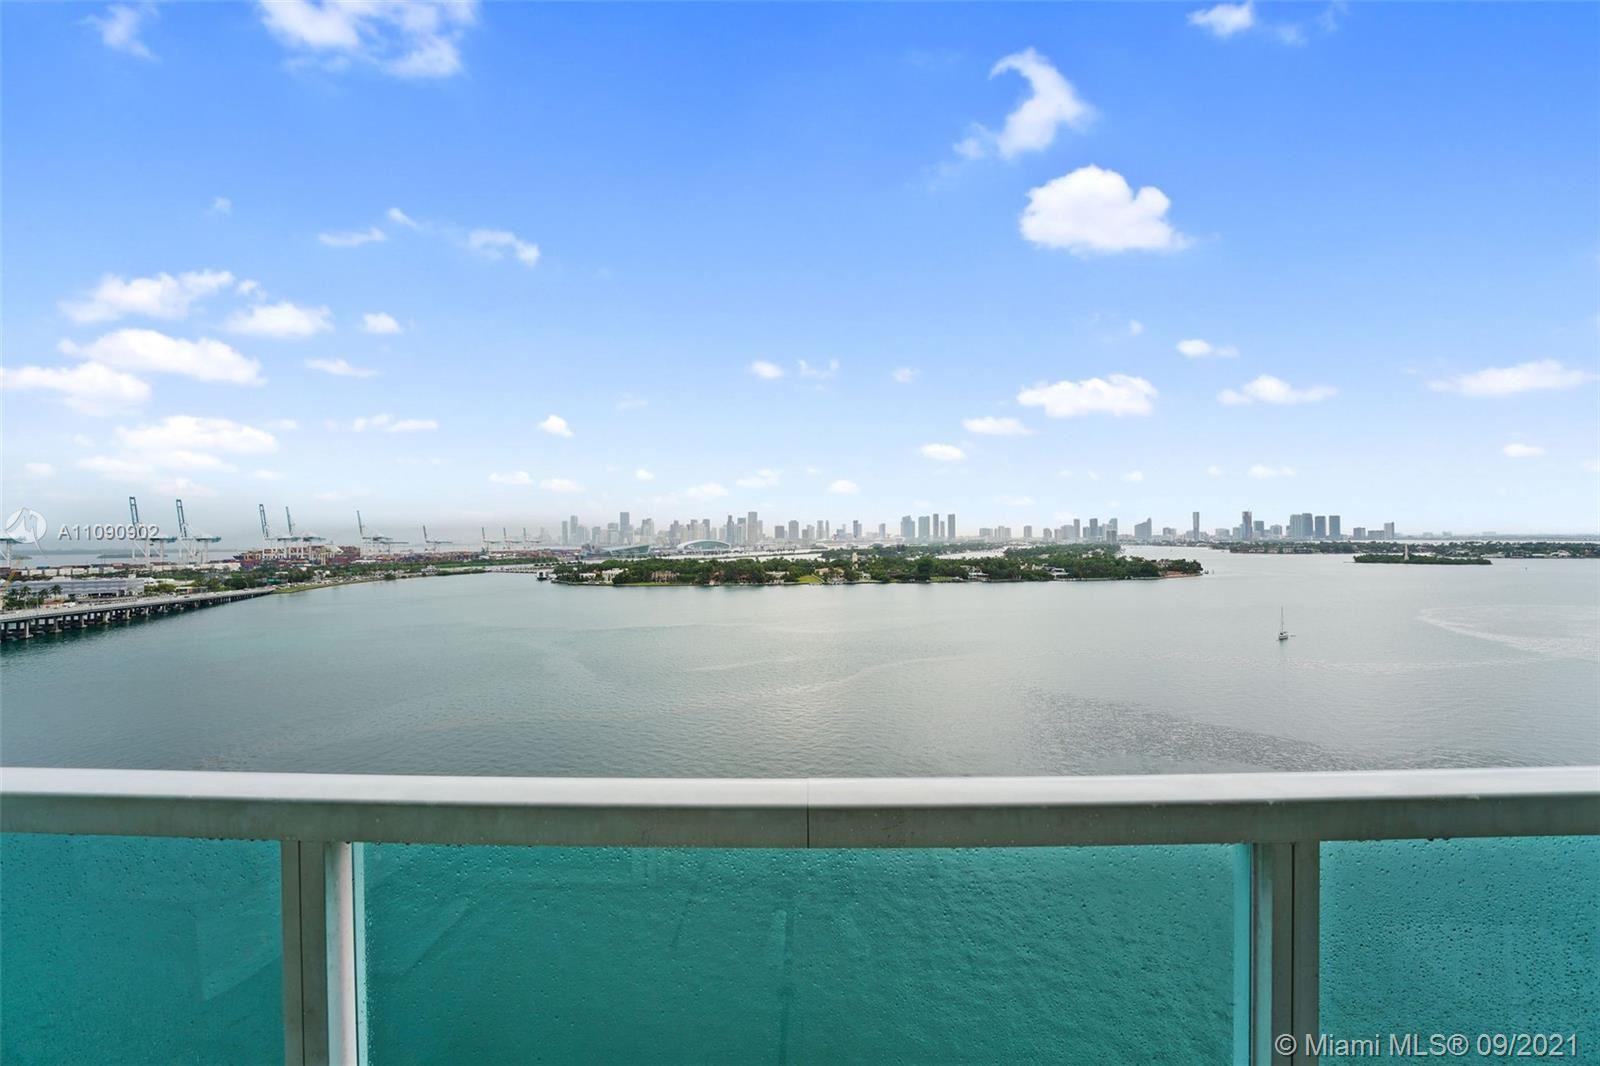 650 West Ave #1809, Miami Beach, FL 33139 - #: A11090902